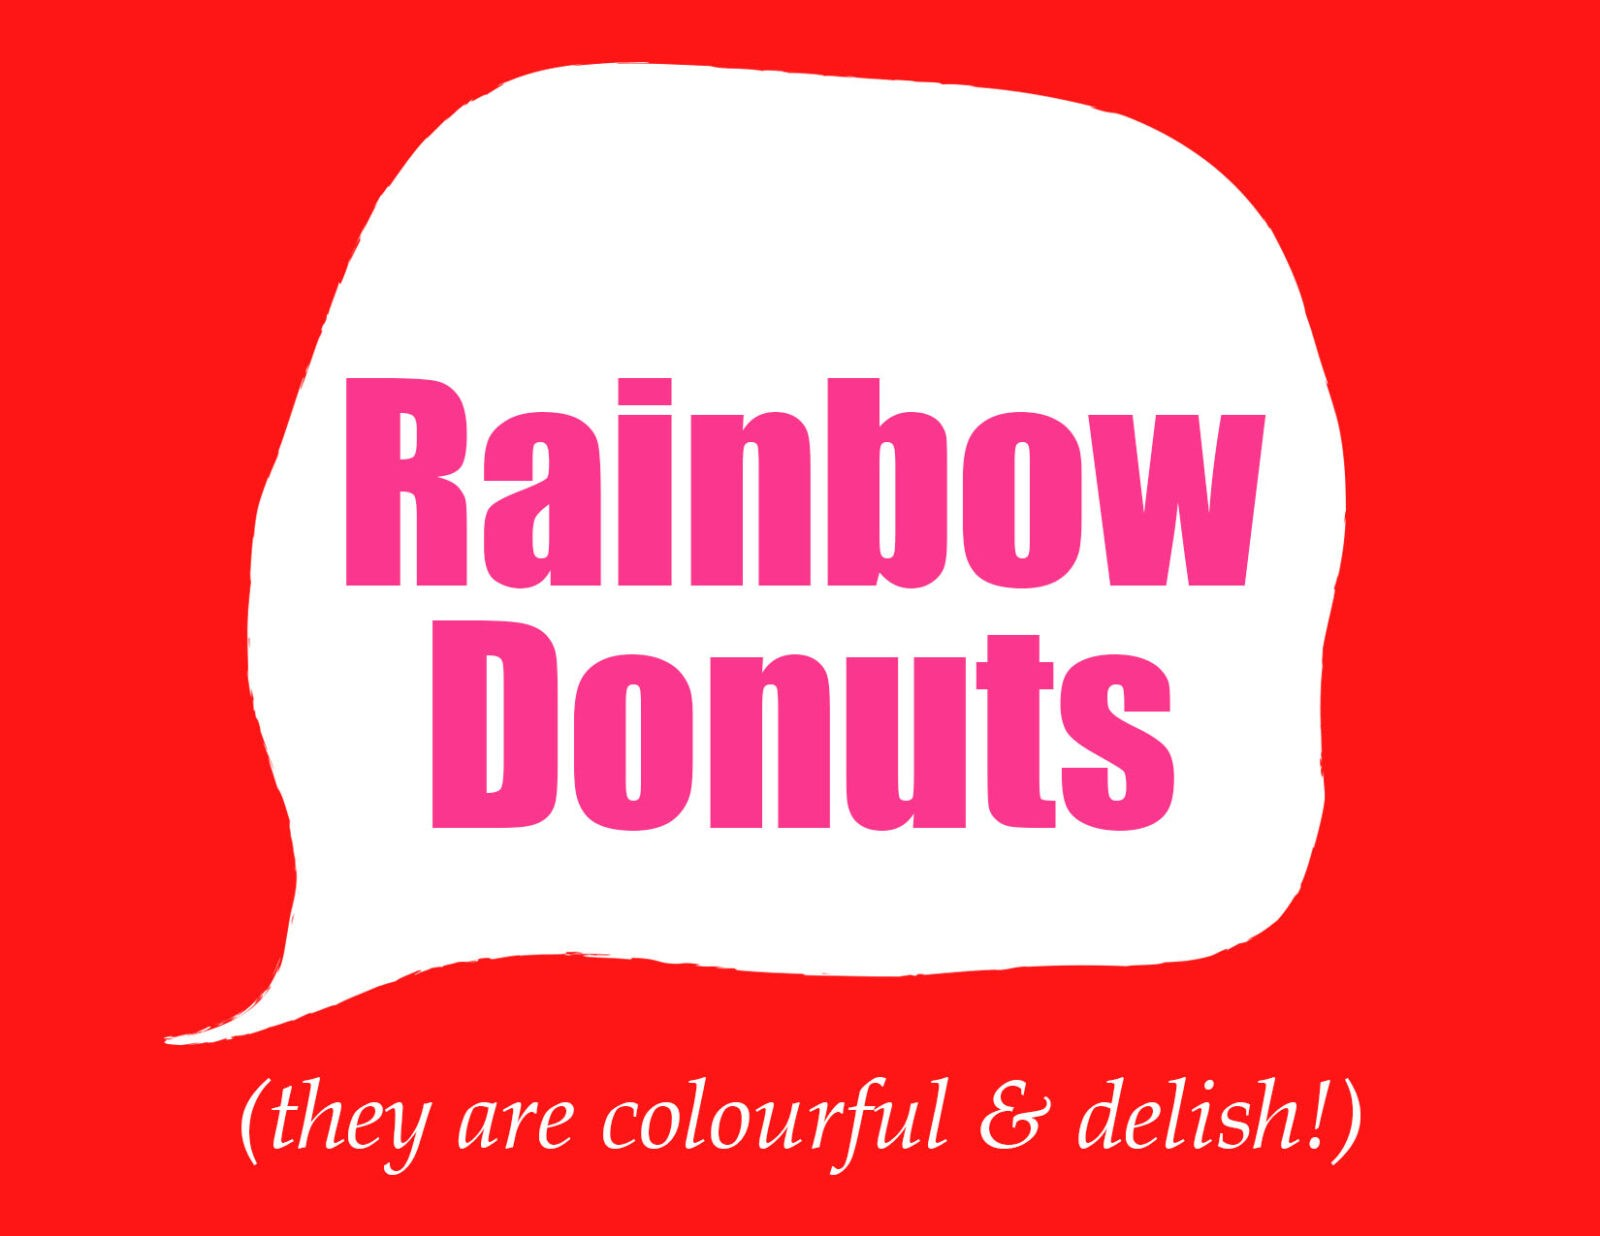 skittles-rainbow-donuts-tailgating-8